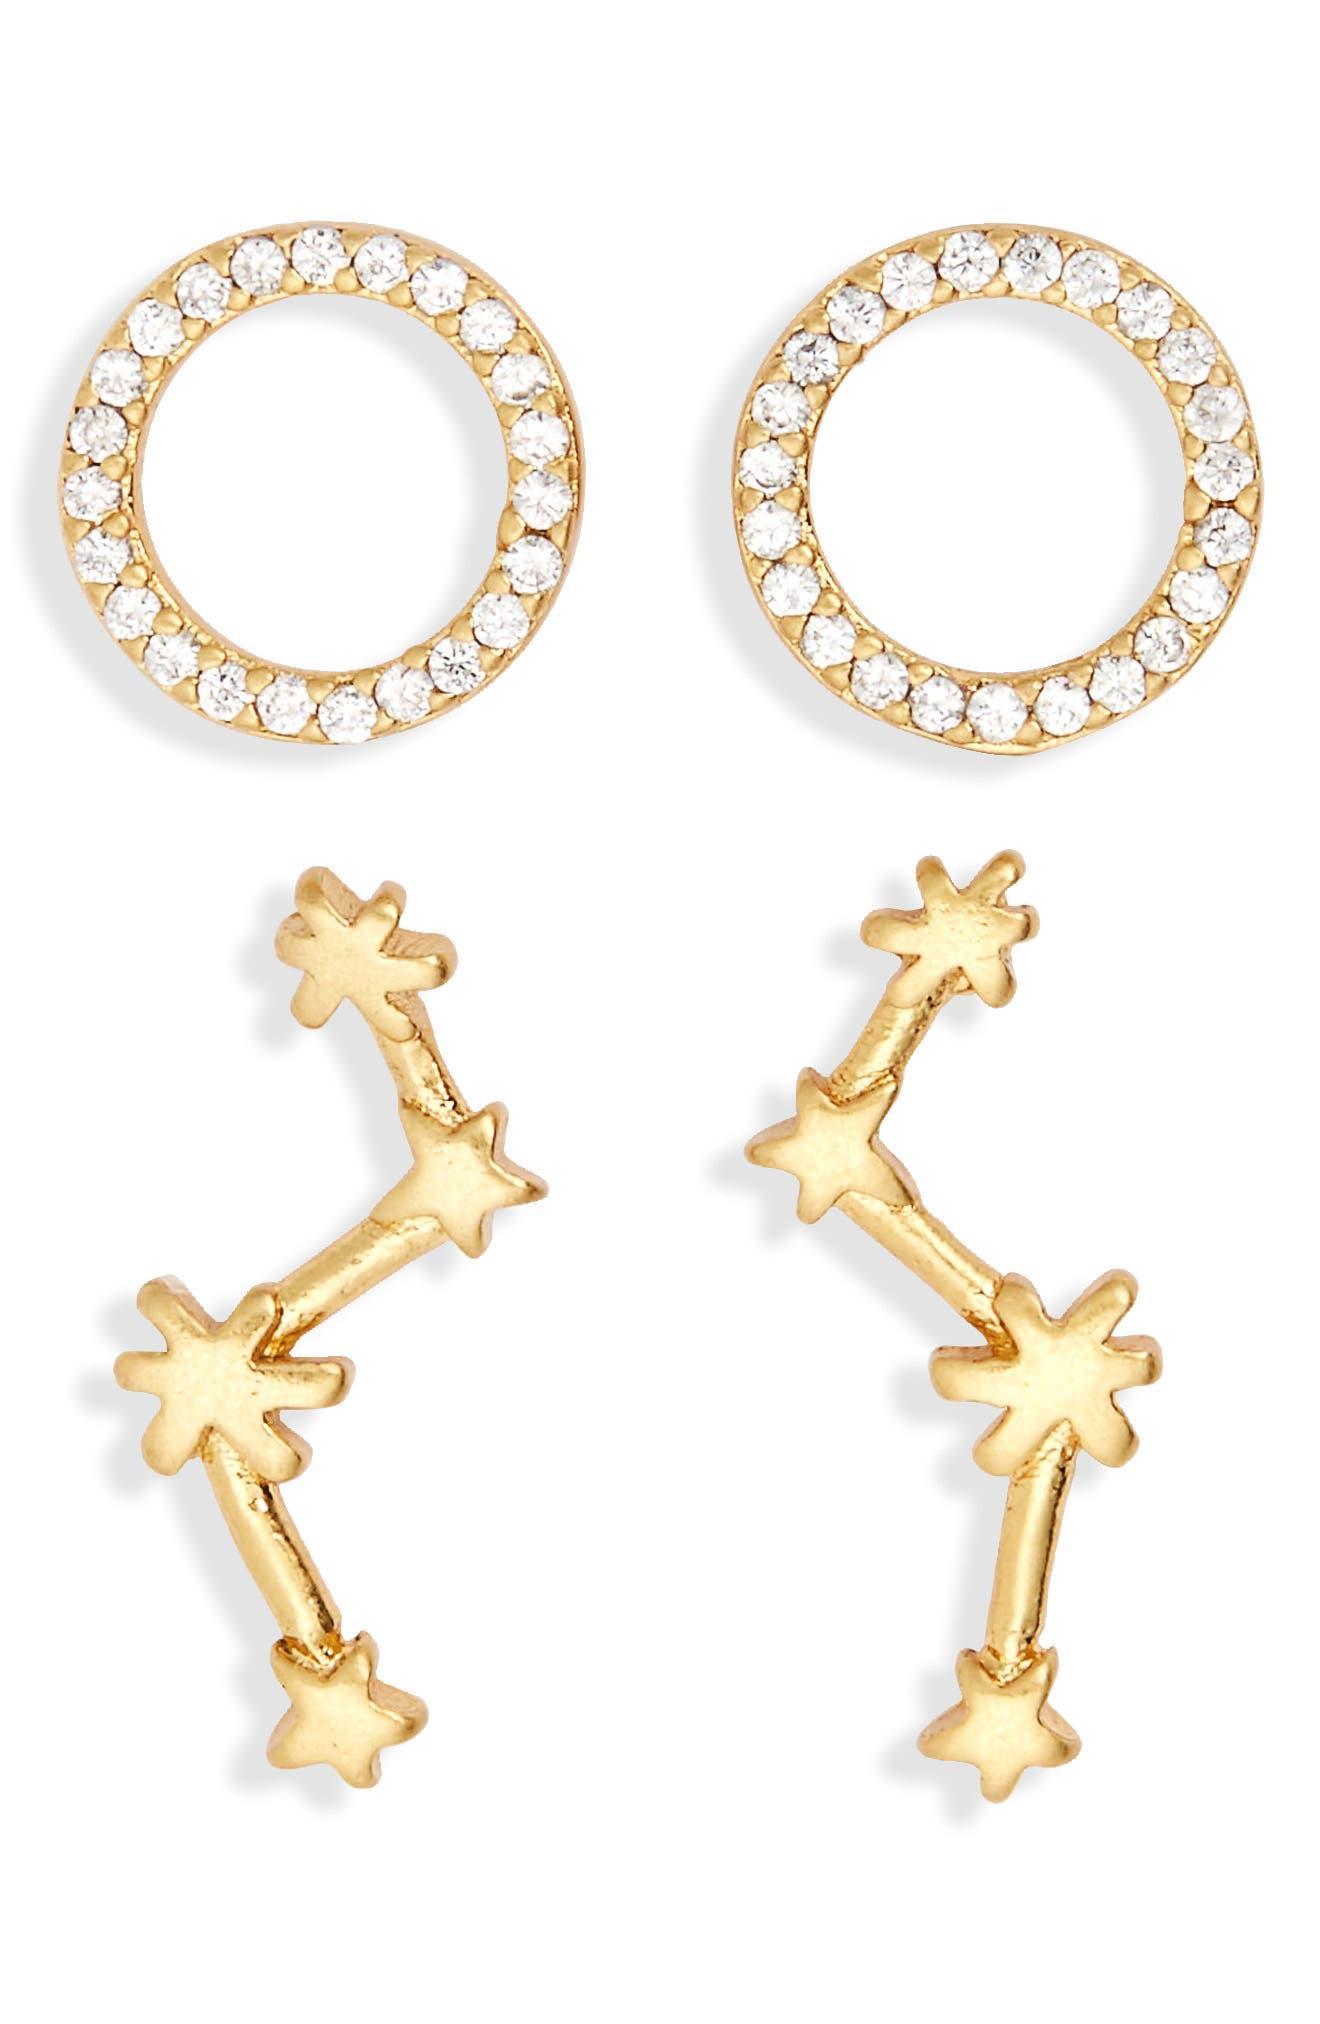 Set of 2 Mismatched Stud Earrings,                         Main,                         color, Vintage Gold